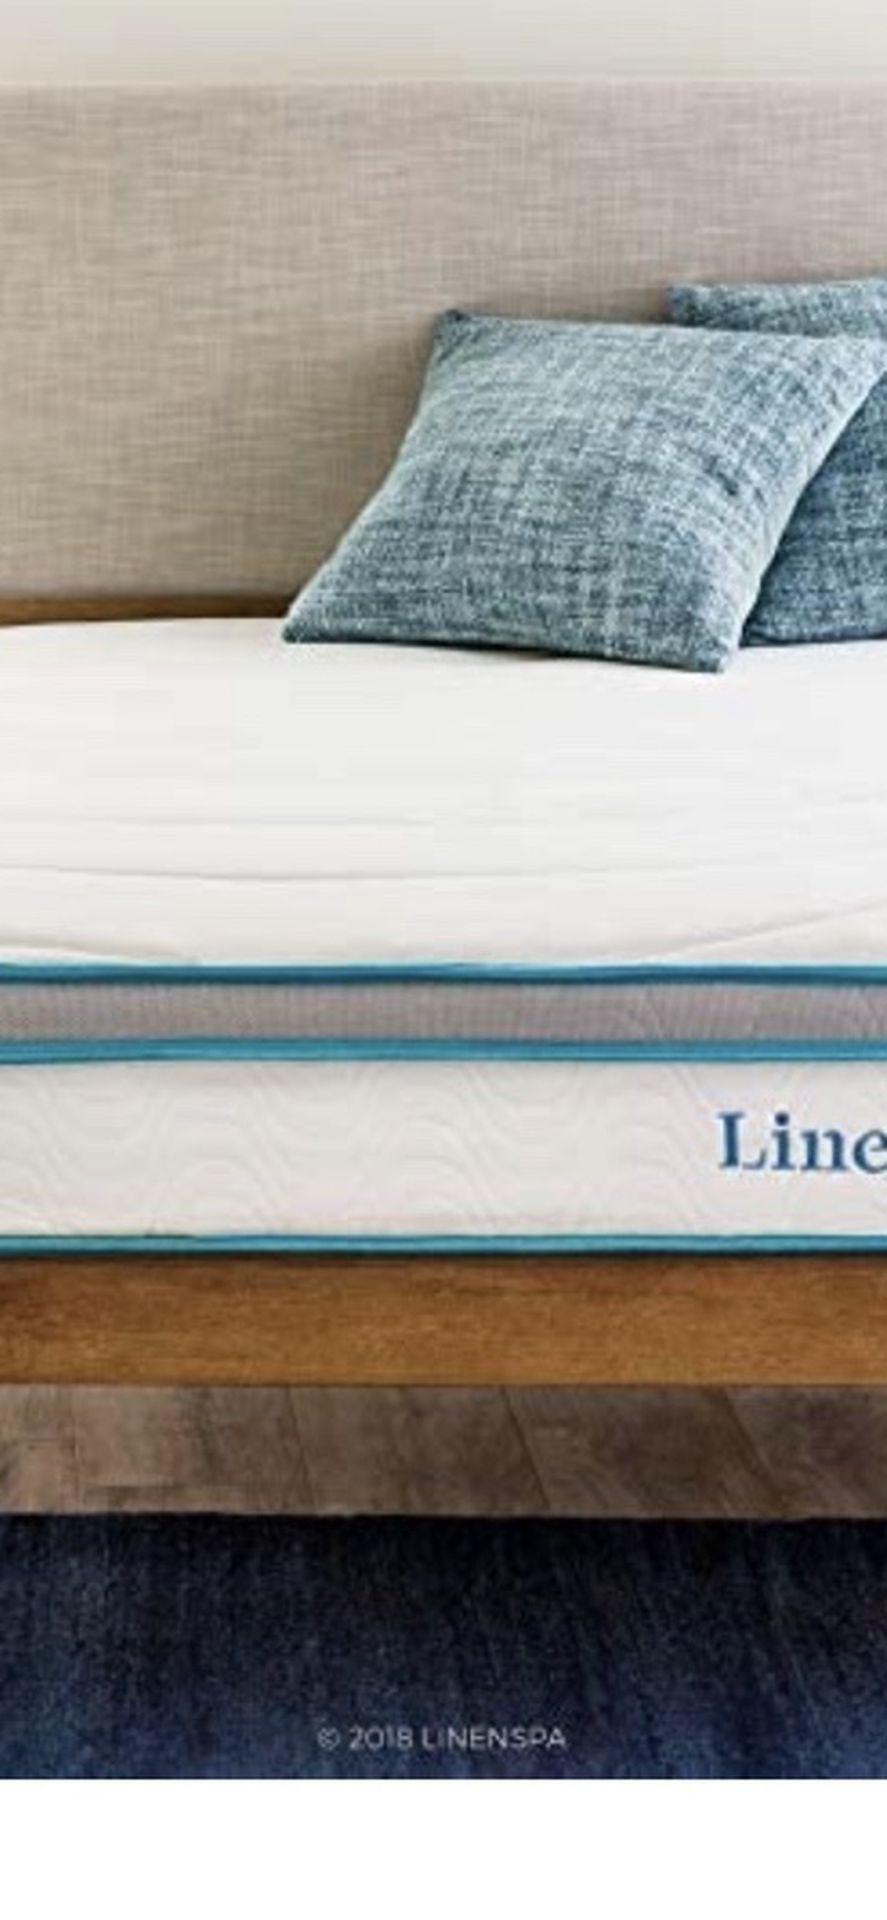 Linenspa 8 Inch Memory Foam and Innerspring Hybrid Medium-Firm Feel King Size Mattress, White